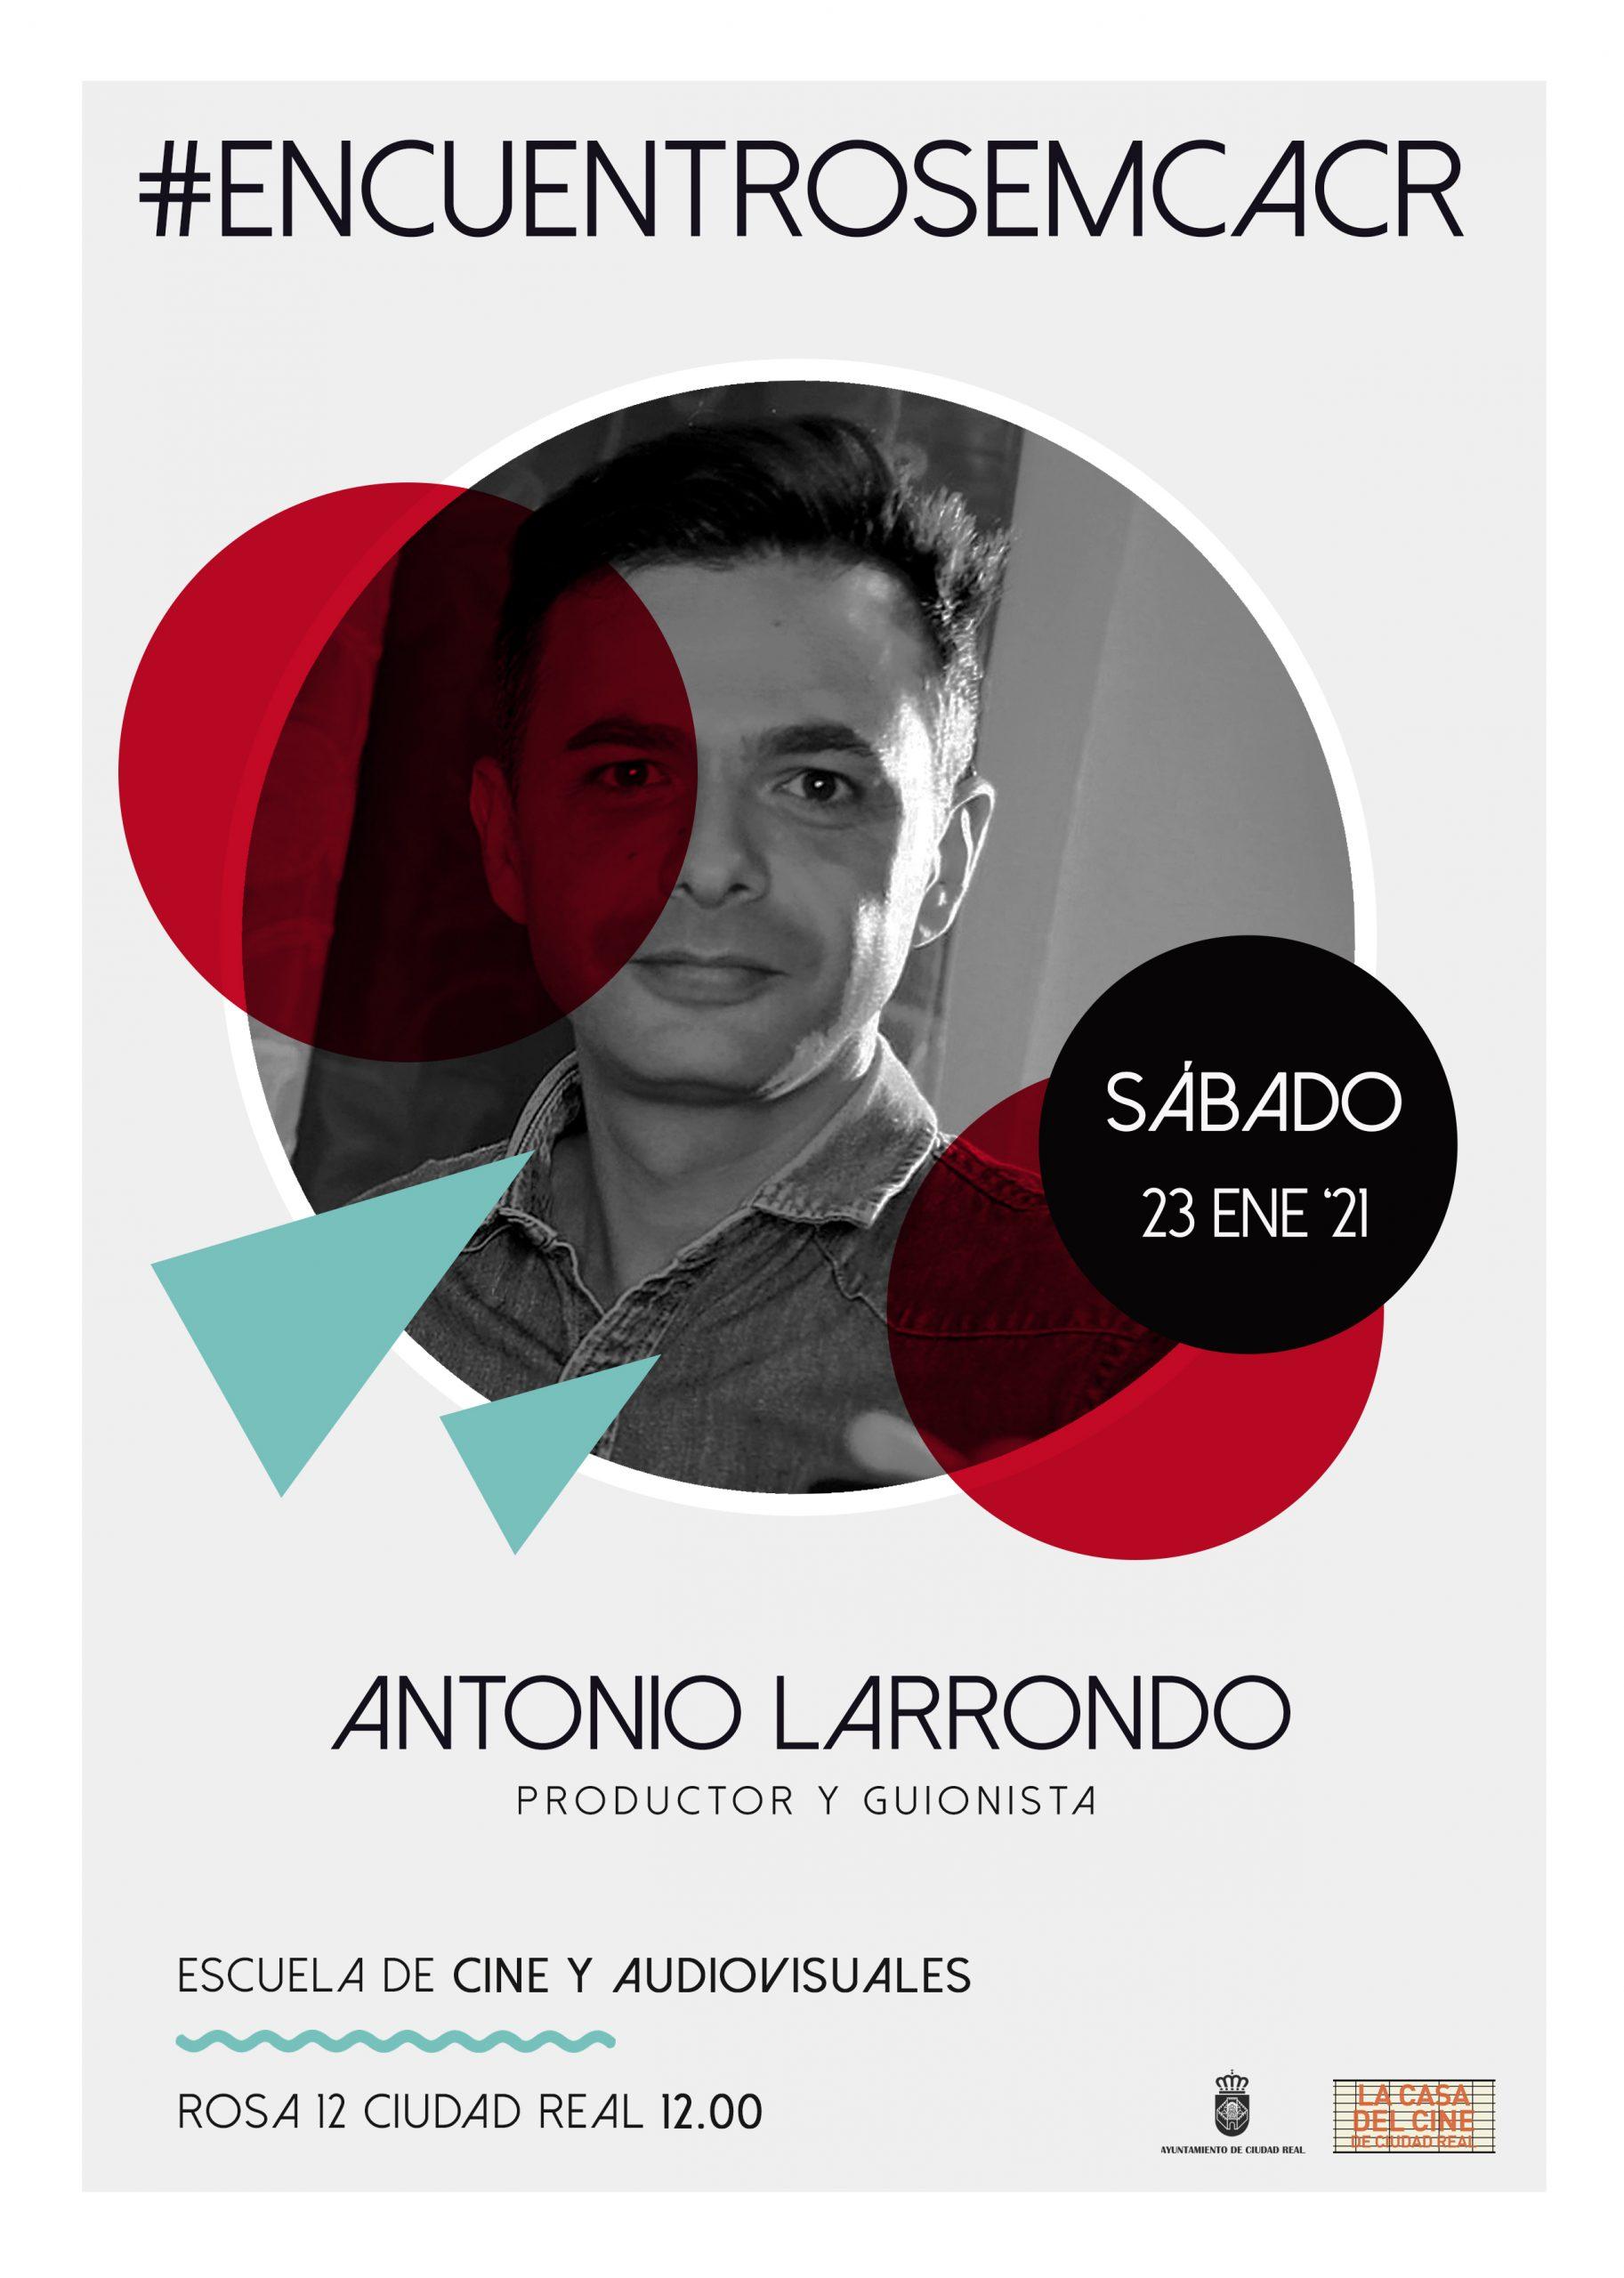 #EncuentrosEMCACR con Antonio Larrondo